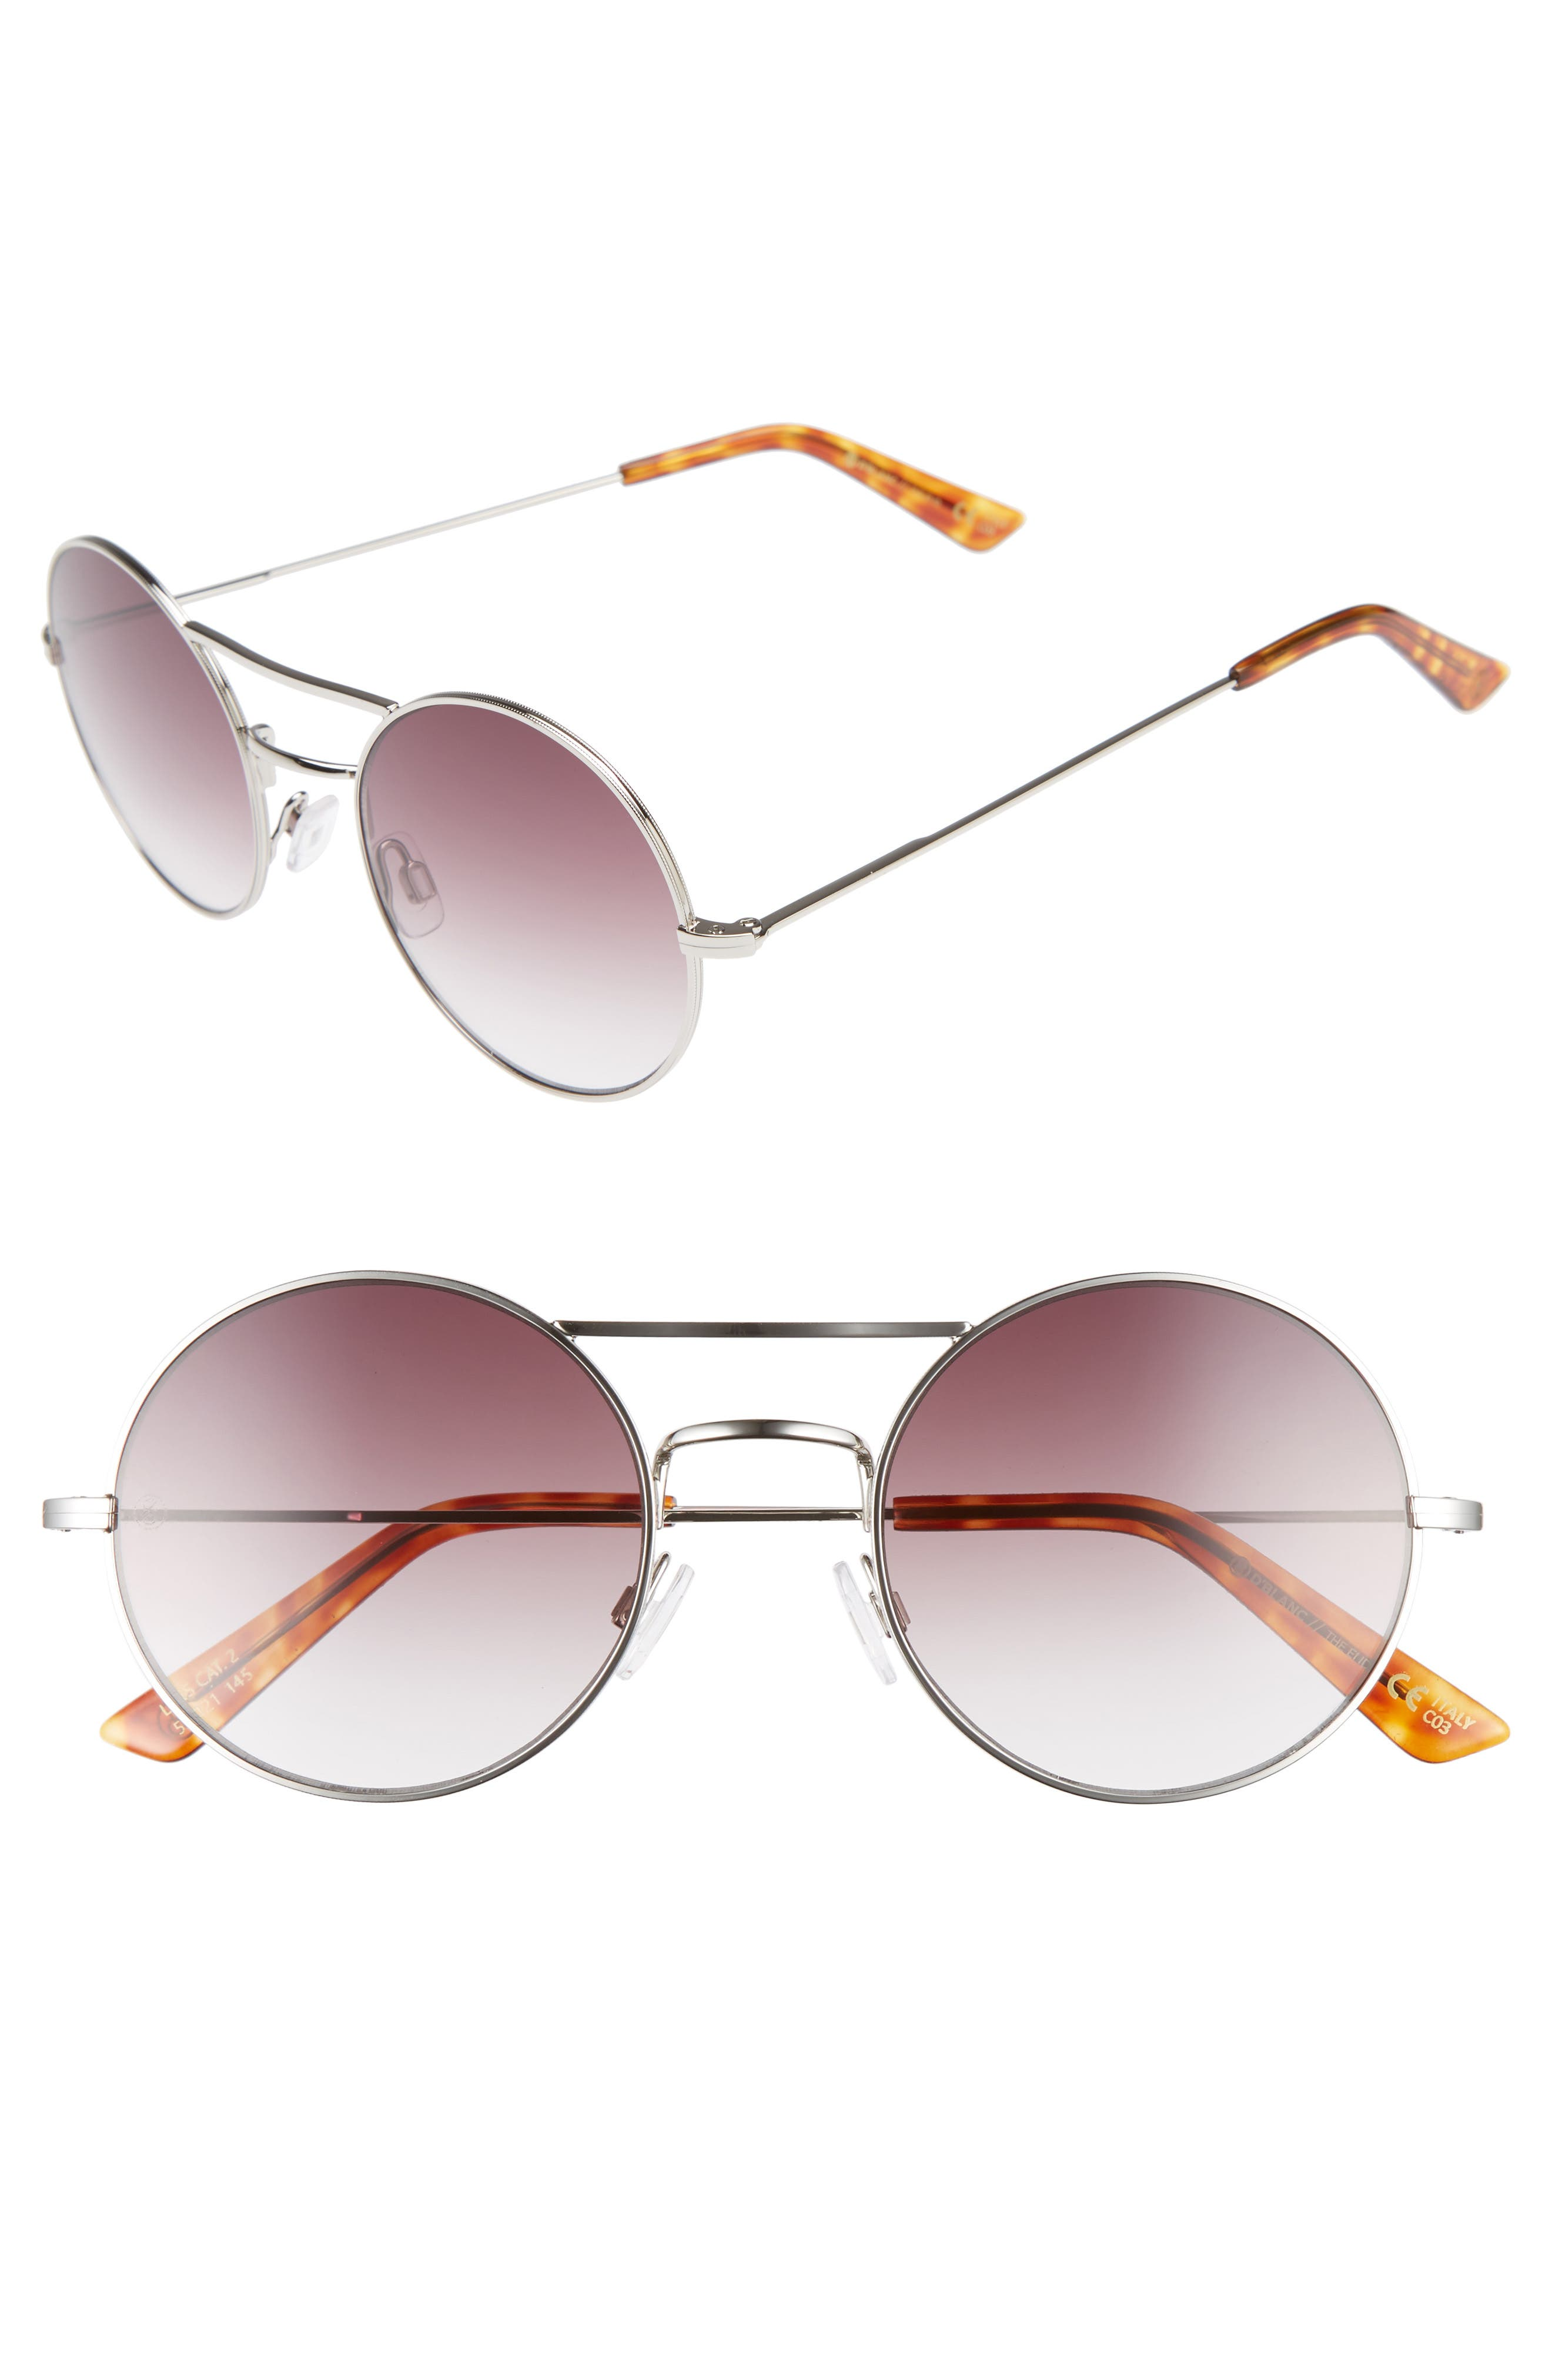 D'BLANC The End 52mm Gradient Round Sunglasses,                             Main thumbnail 1, color,                             040